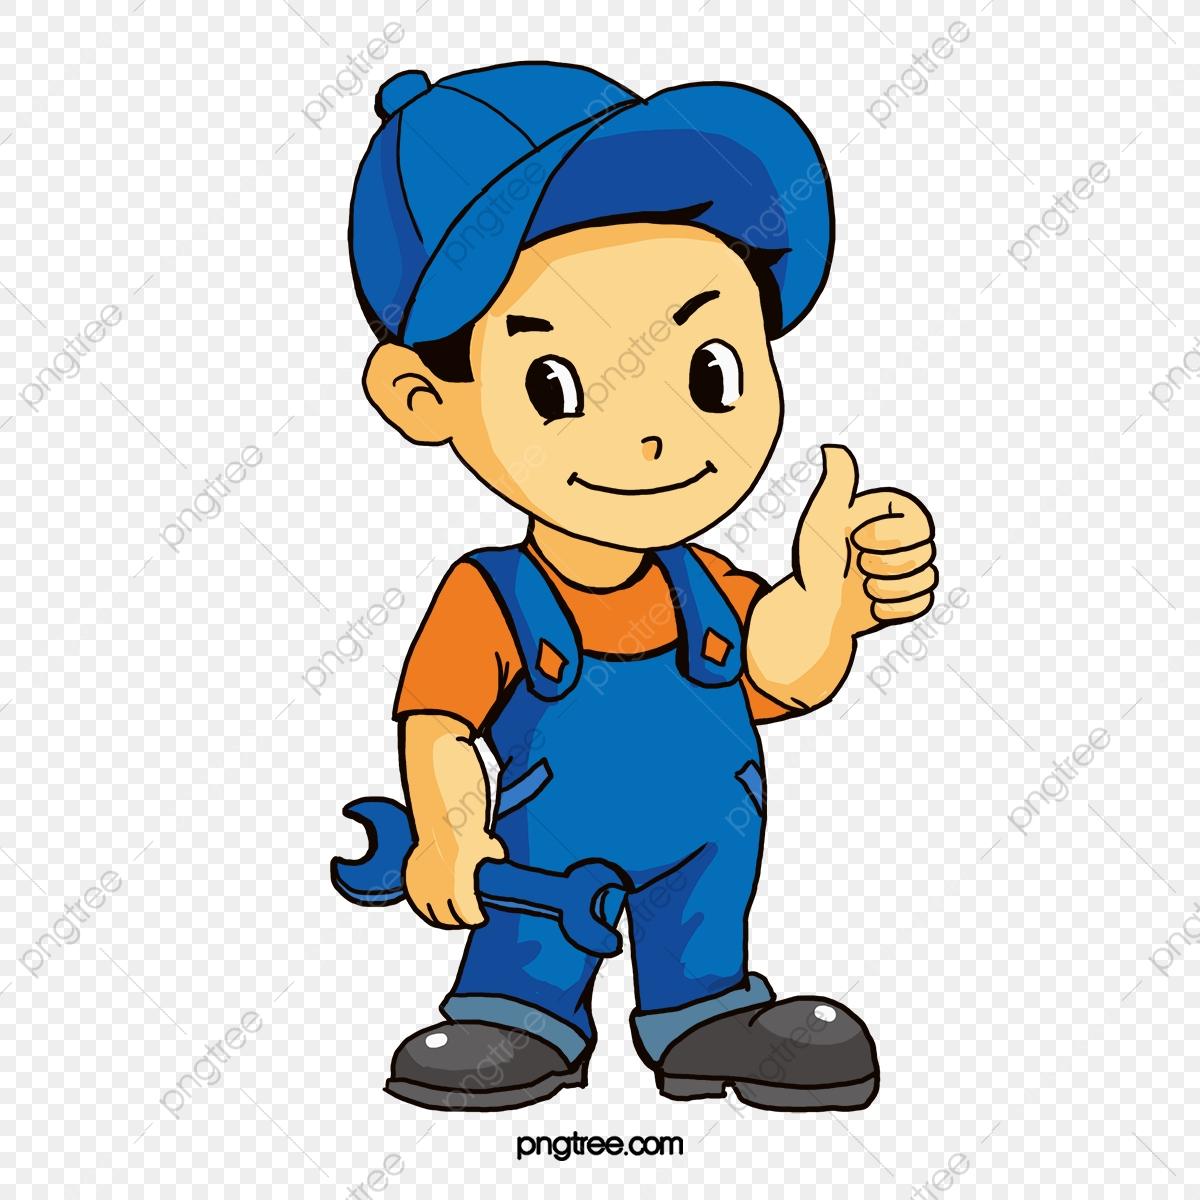 Cute Boy, Cute Clipart, Boy Clipart, Cartoon PNG Transparent Clipart.